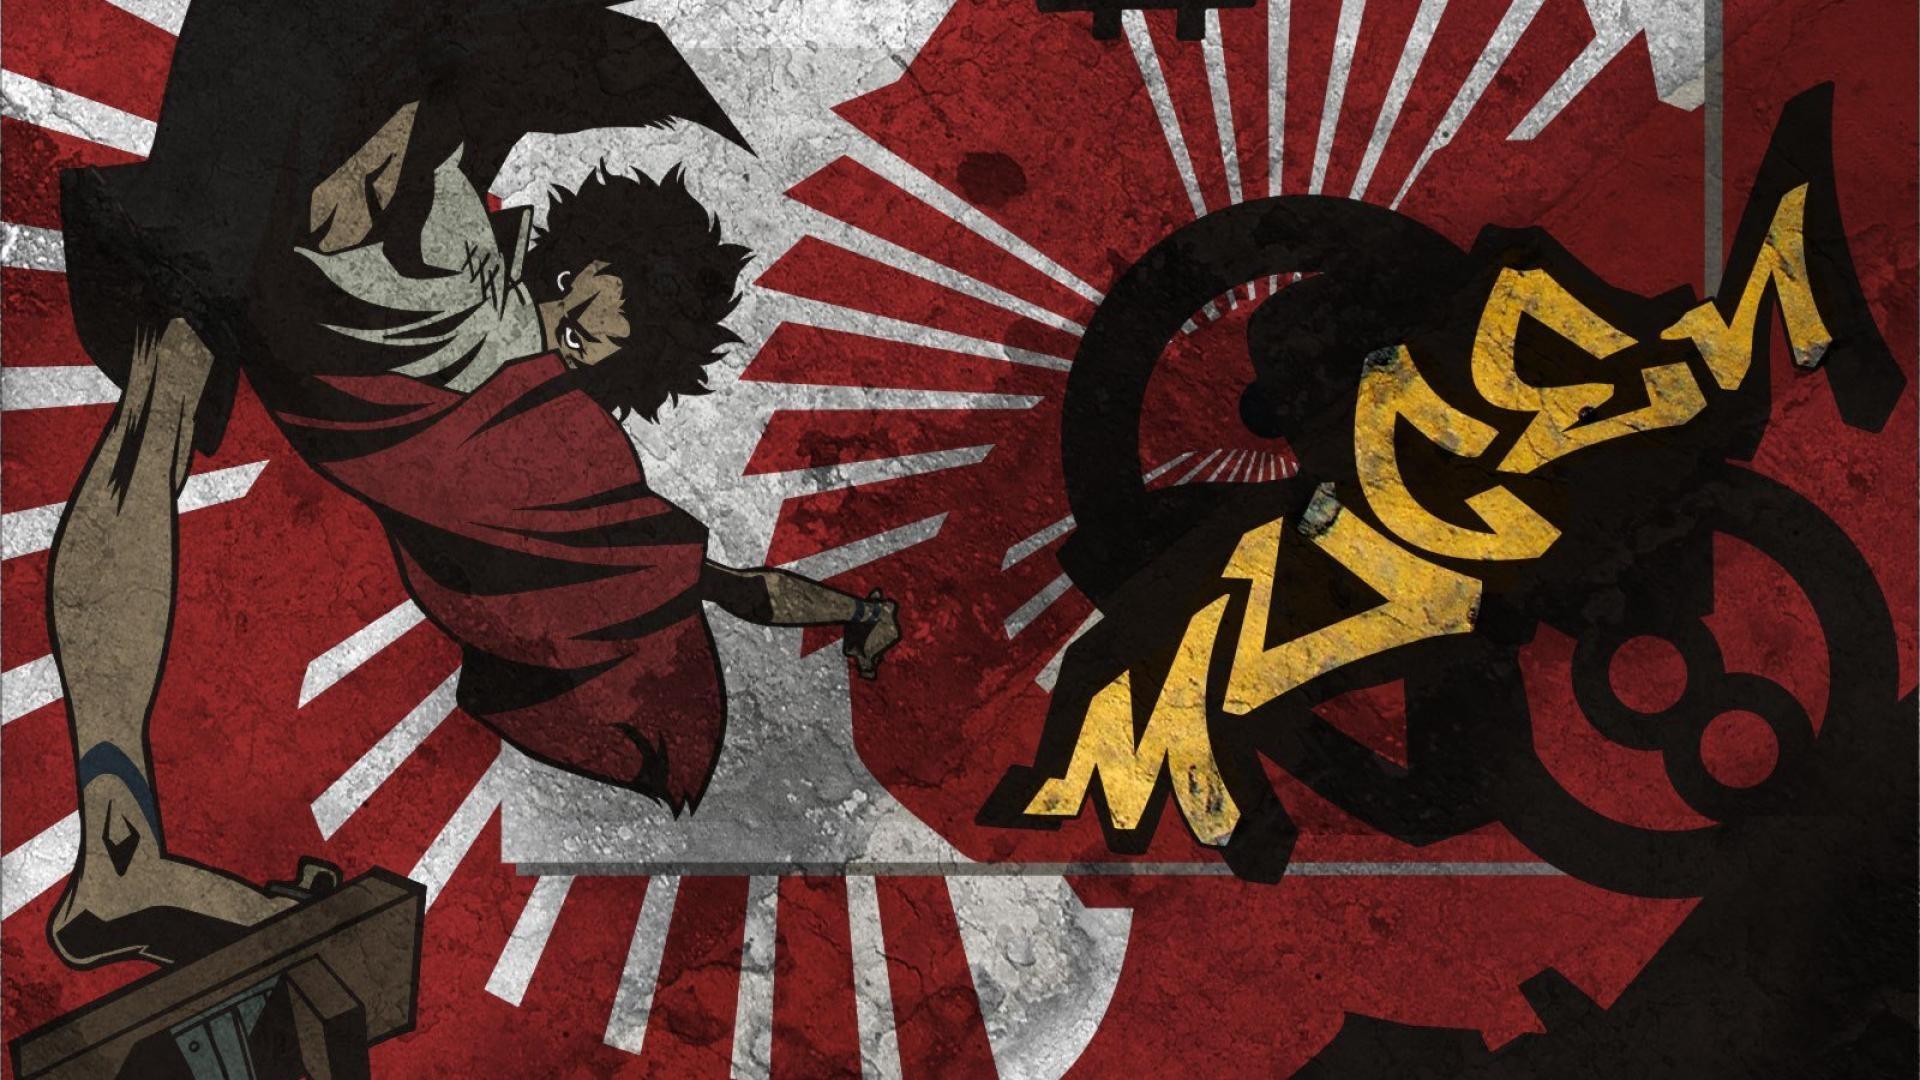 Samurai champloo wallpaper 1600×1200 – (#29603) – High Quality and .